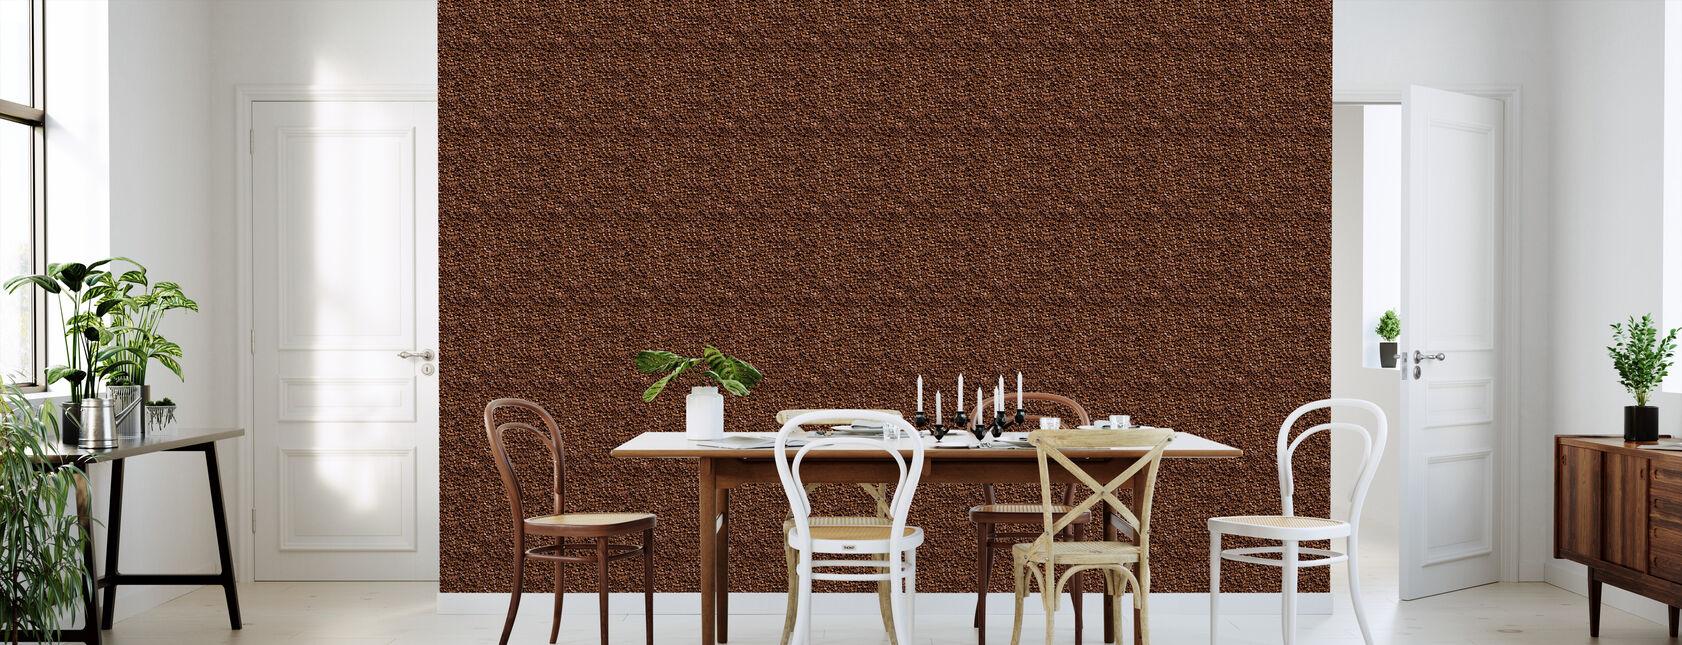 Coffee Beans - Natural Size - Wallpaper - Kitchen